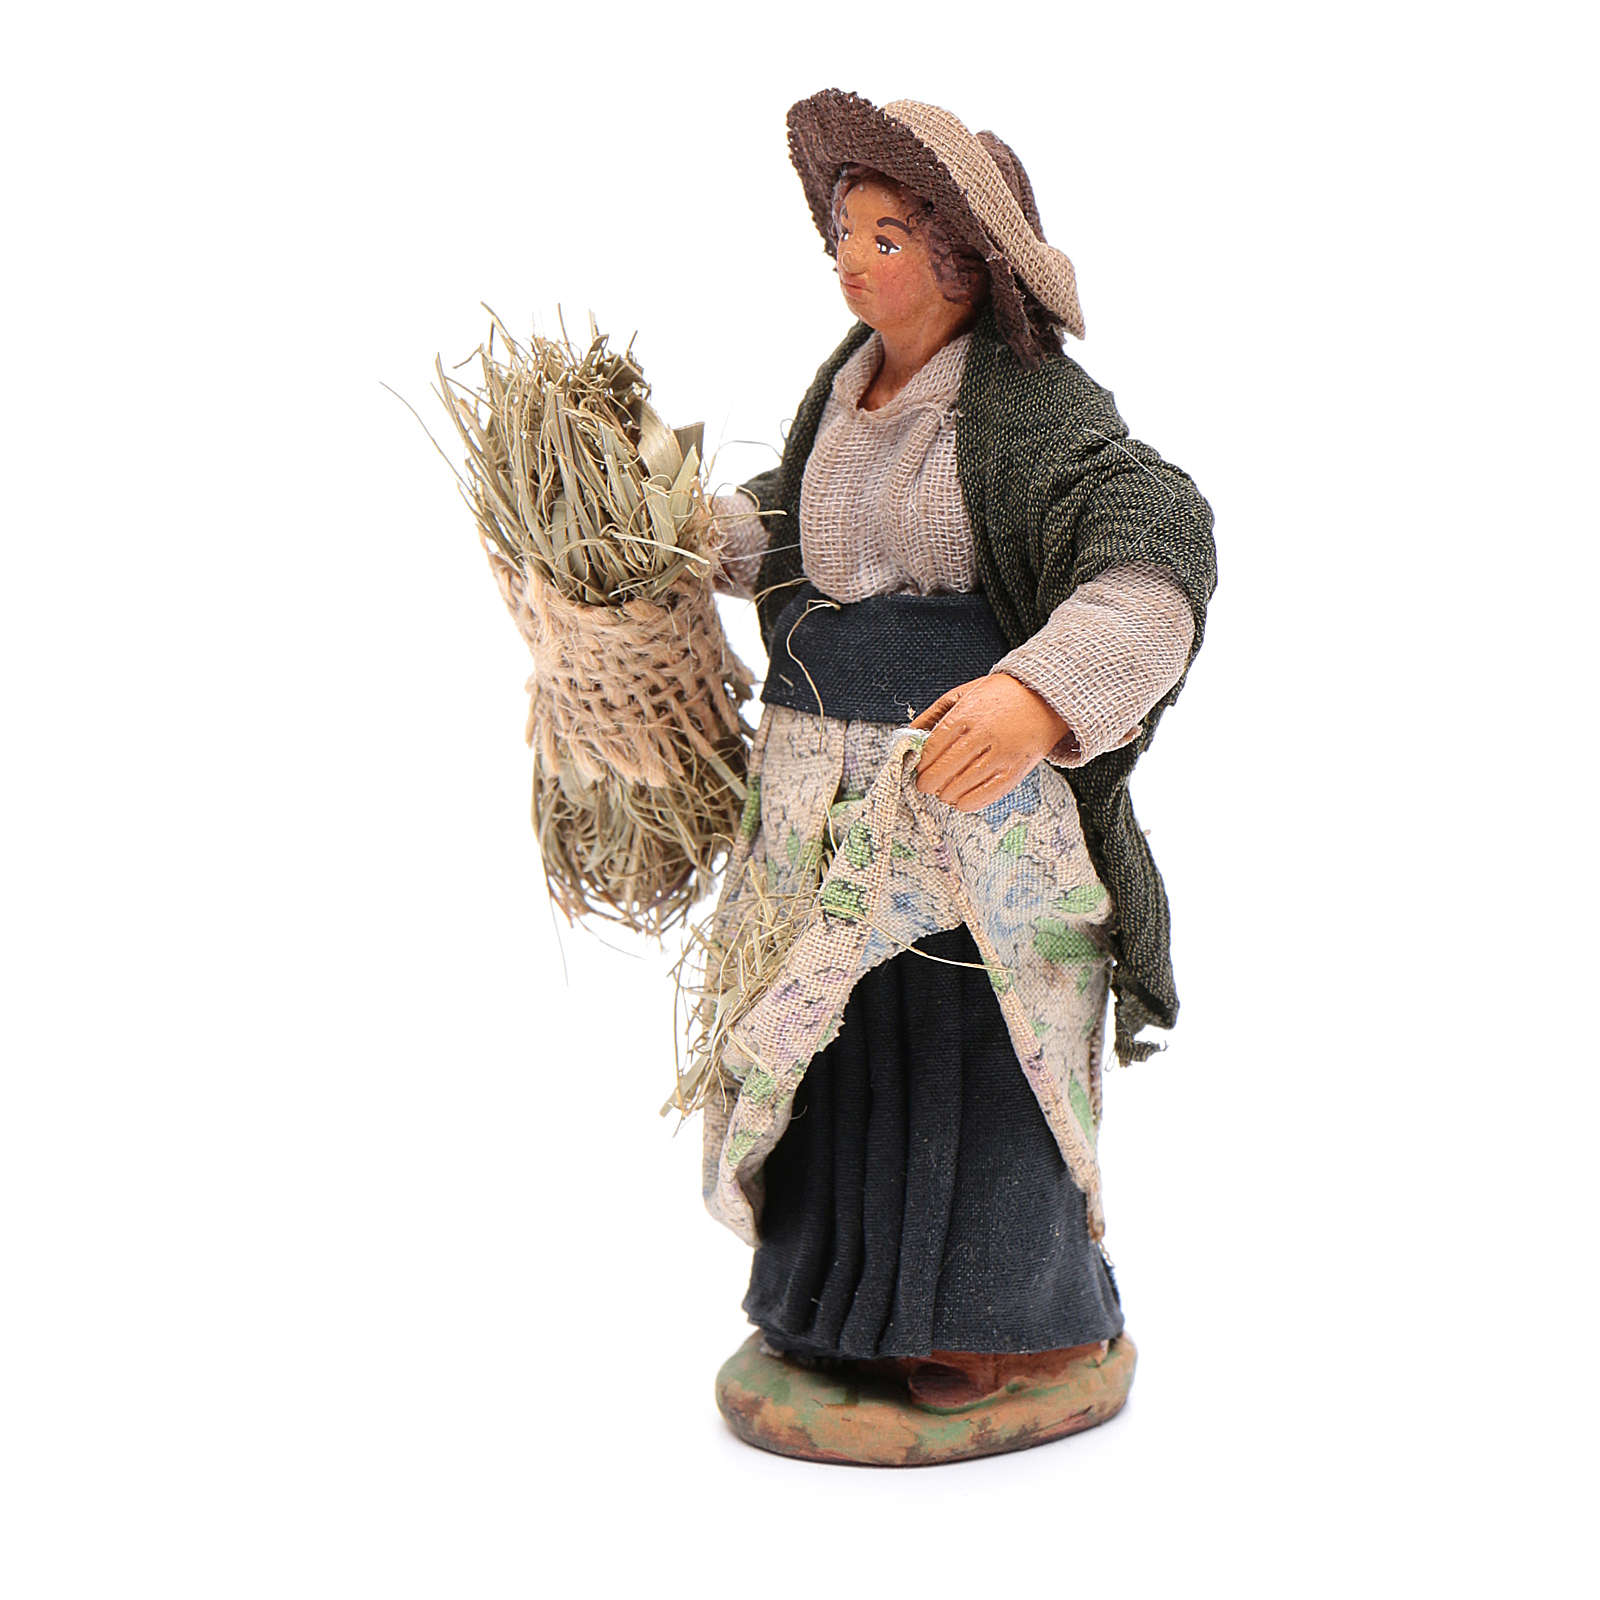 Reaper woman 10cm, Neapolitan Nativity figurine 4